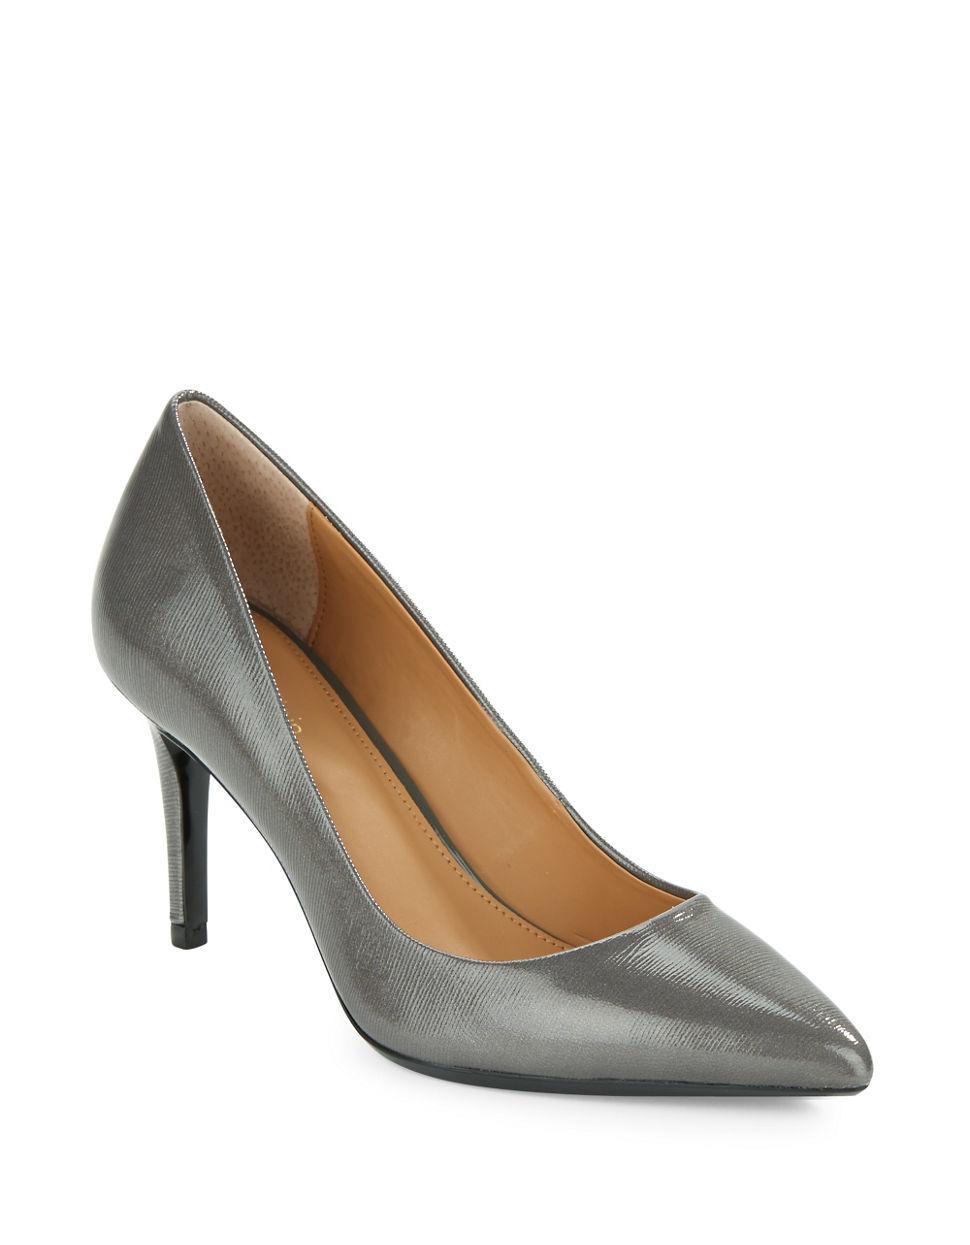 Calvin Klein Wedge Shoes Uk